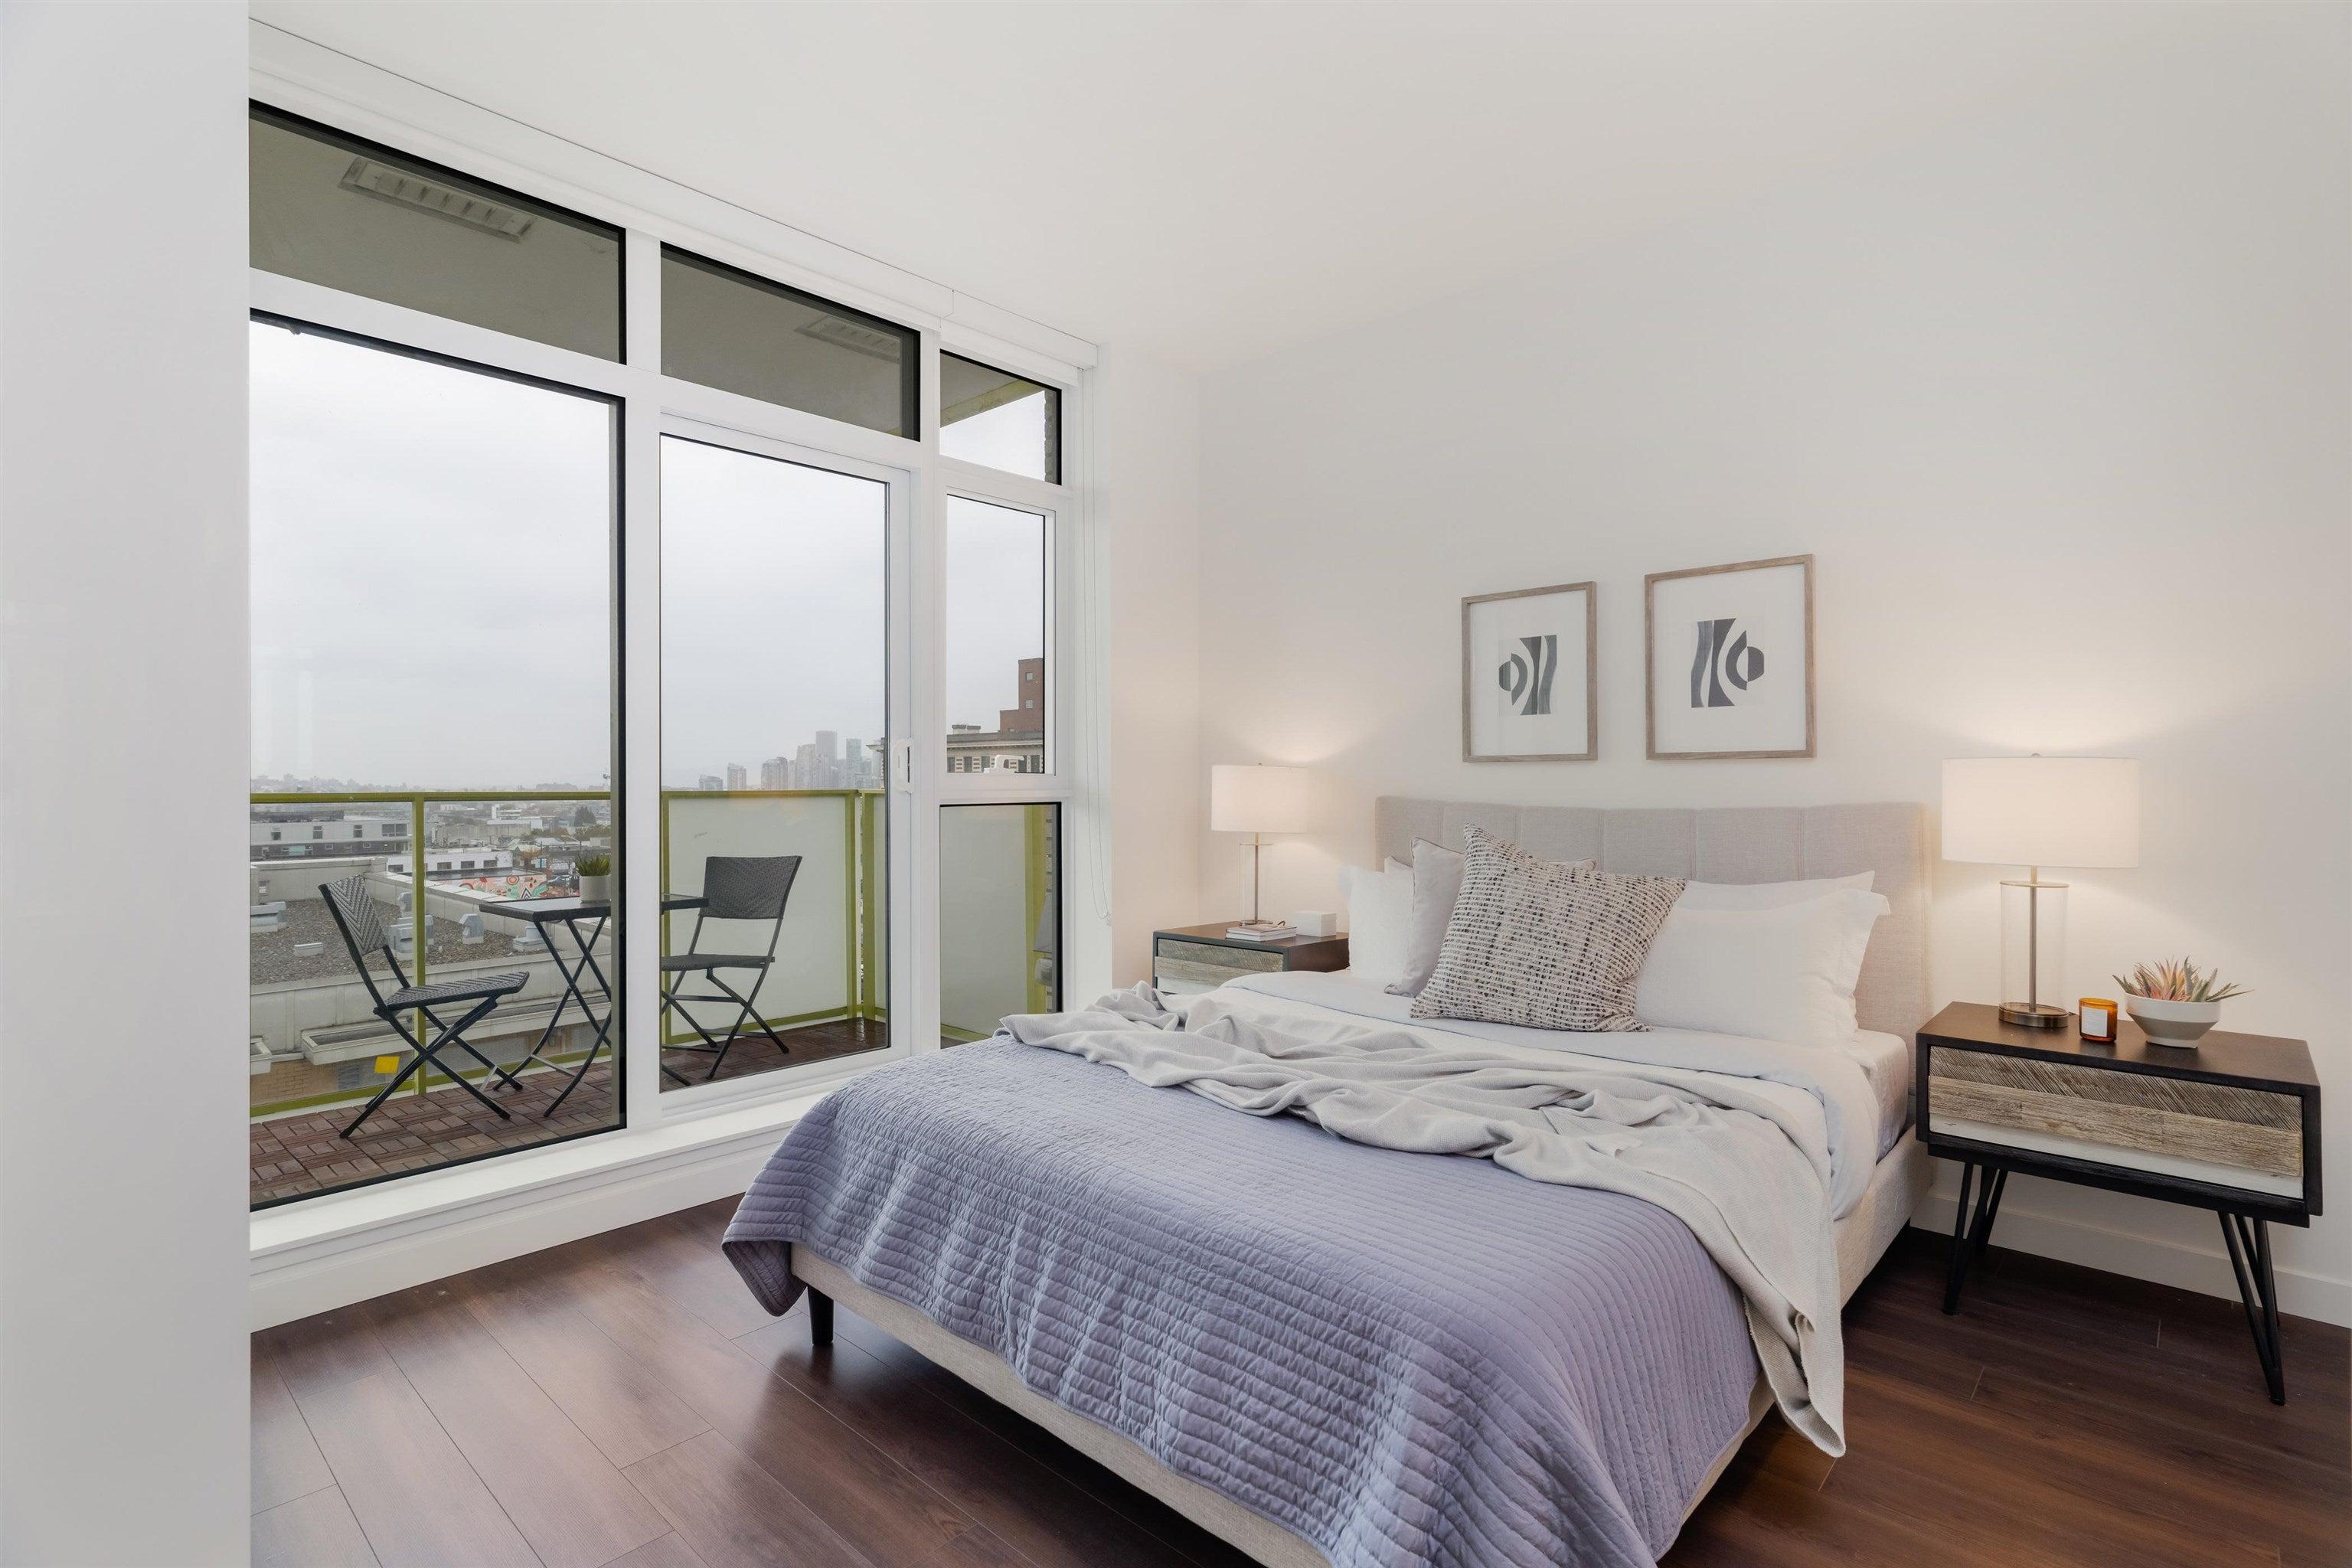 523 2508 WATSON STREET - Mount Pleasant VE Townhouse for sale, 3 Bedrooms (R2625701) - #18